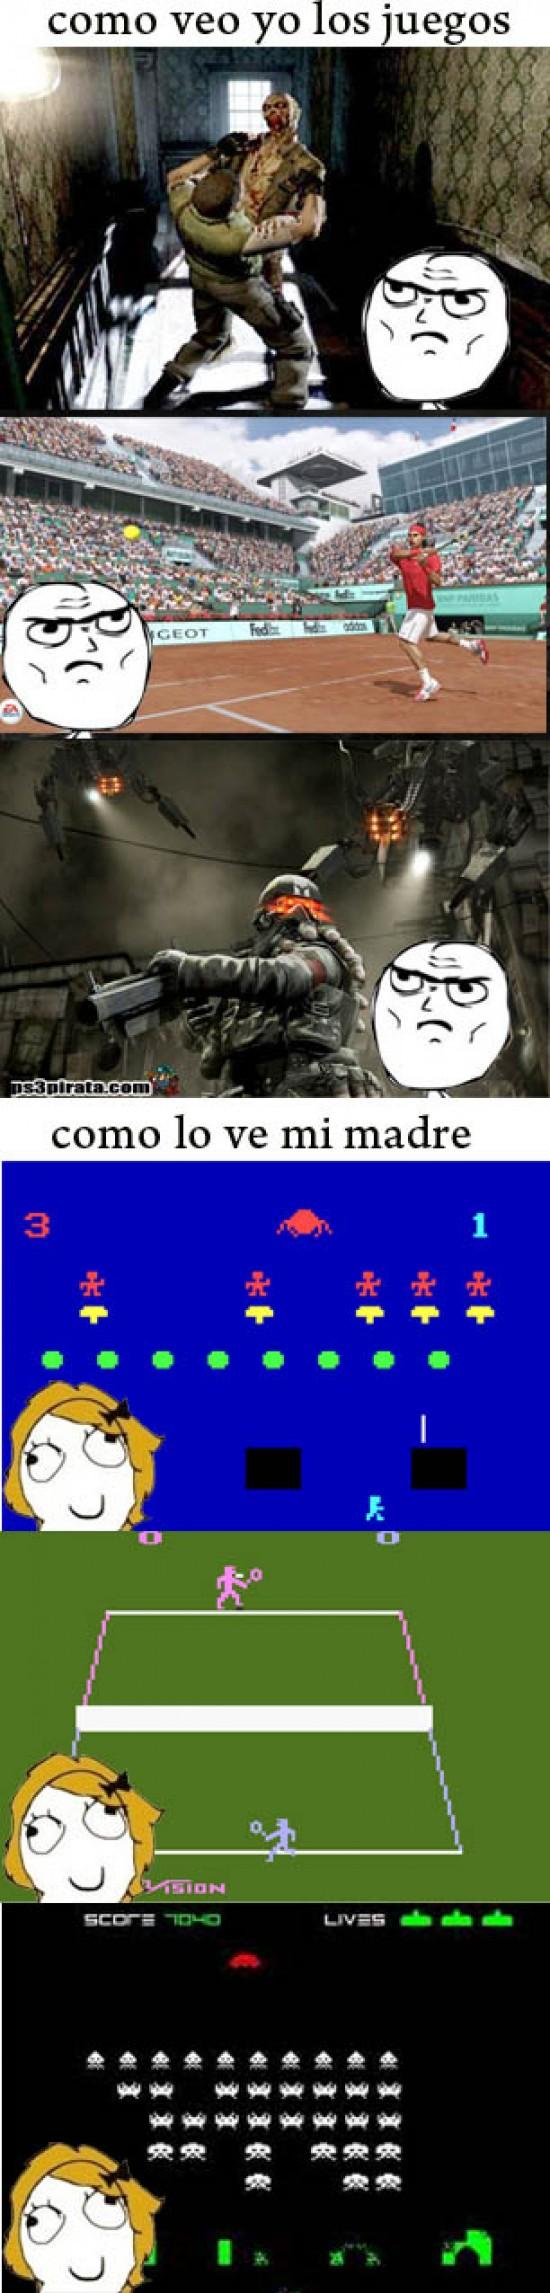 Friki - Los videojuegos